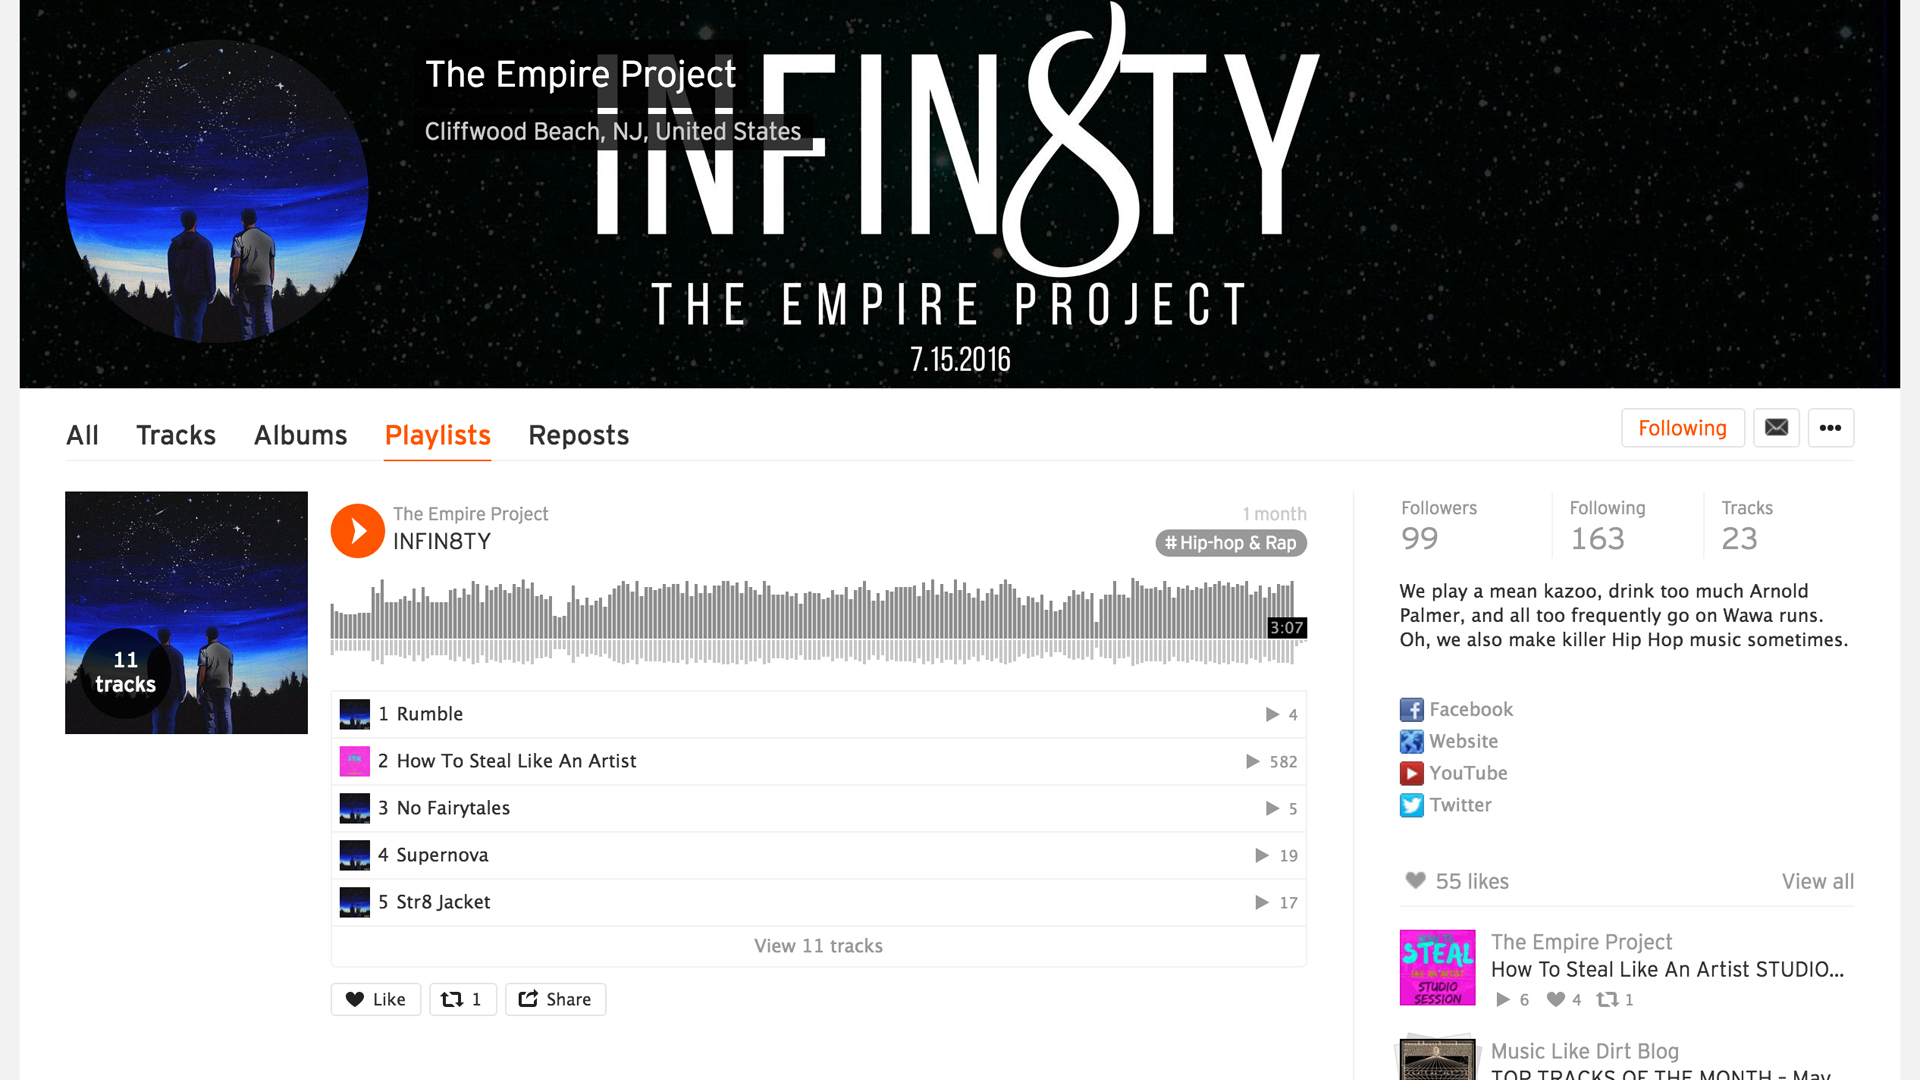 soundcloud.com/theempireprojectnj